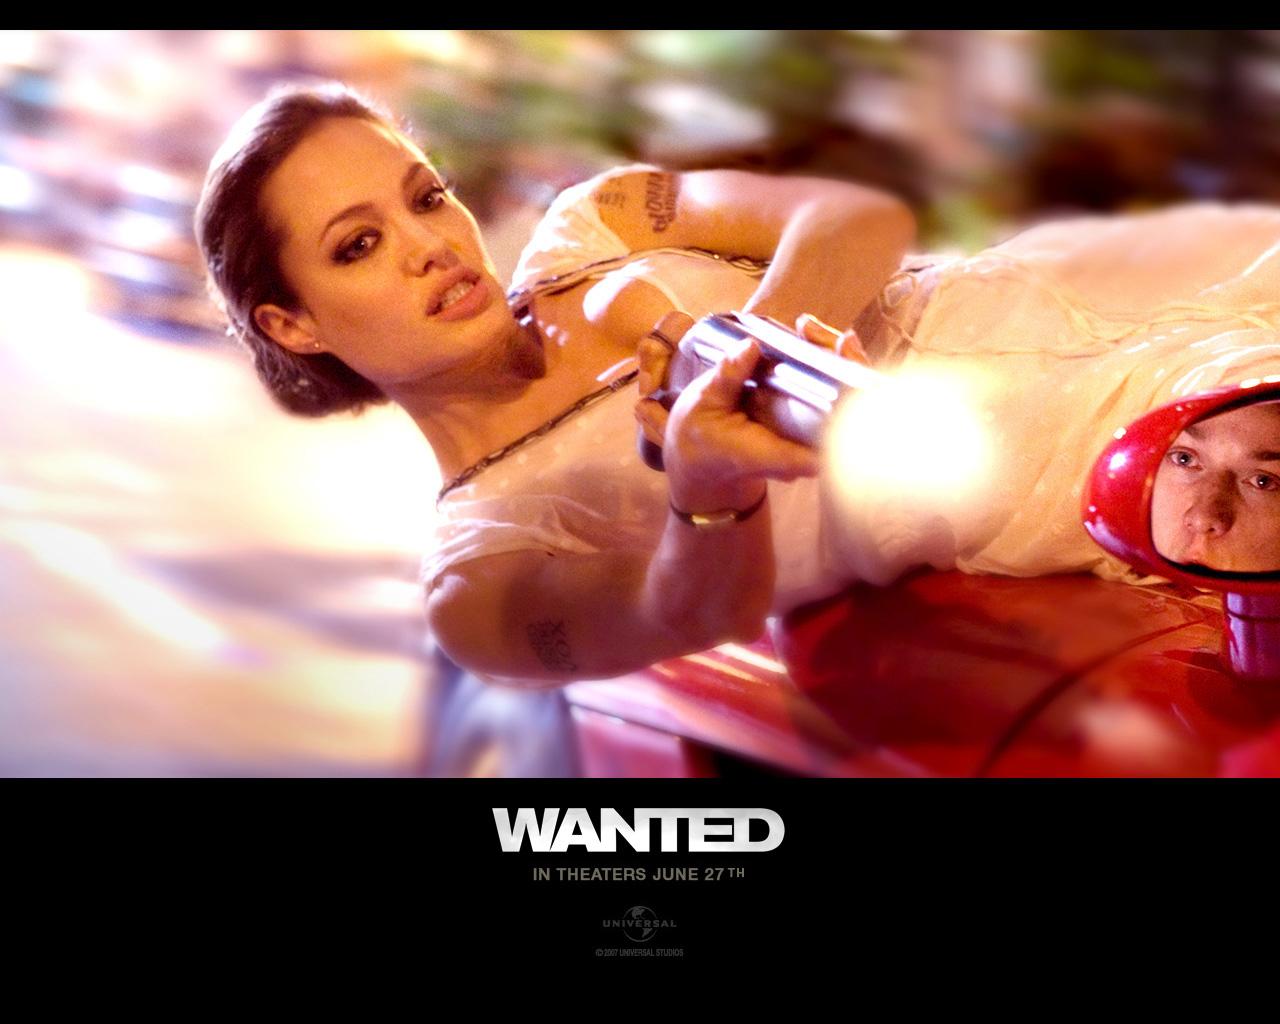 http://3.bp.blogspot.com/_sz2fJjO1XW8/THZ5Z_QzZAI/AAAAAAAACVk/cW4H-f2KaWI/s1600/wanted,_2008,_angelina_jolie_2.jpg